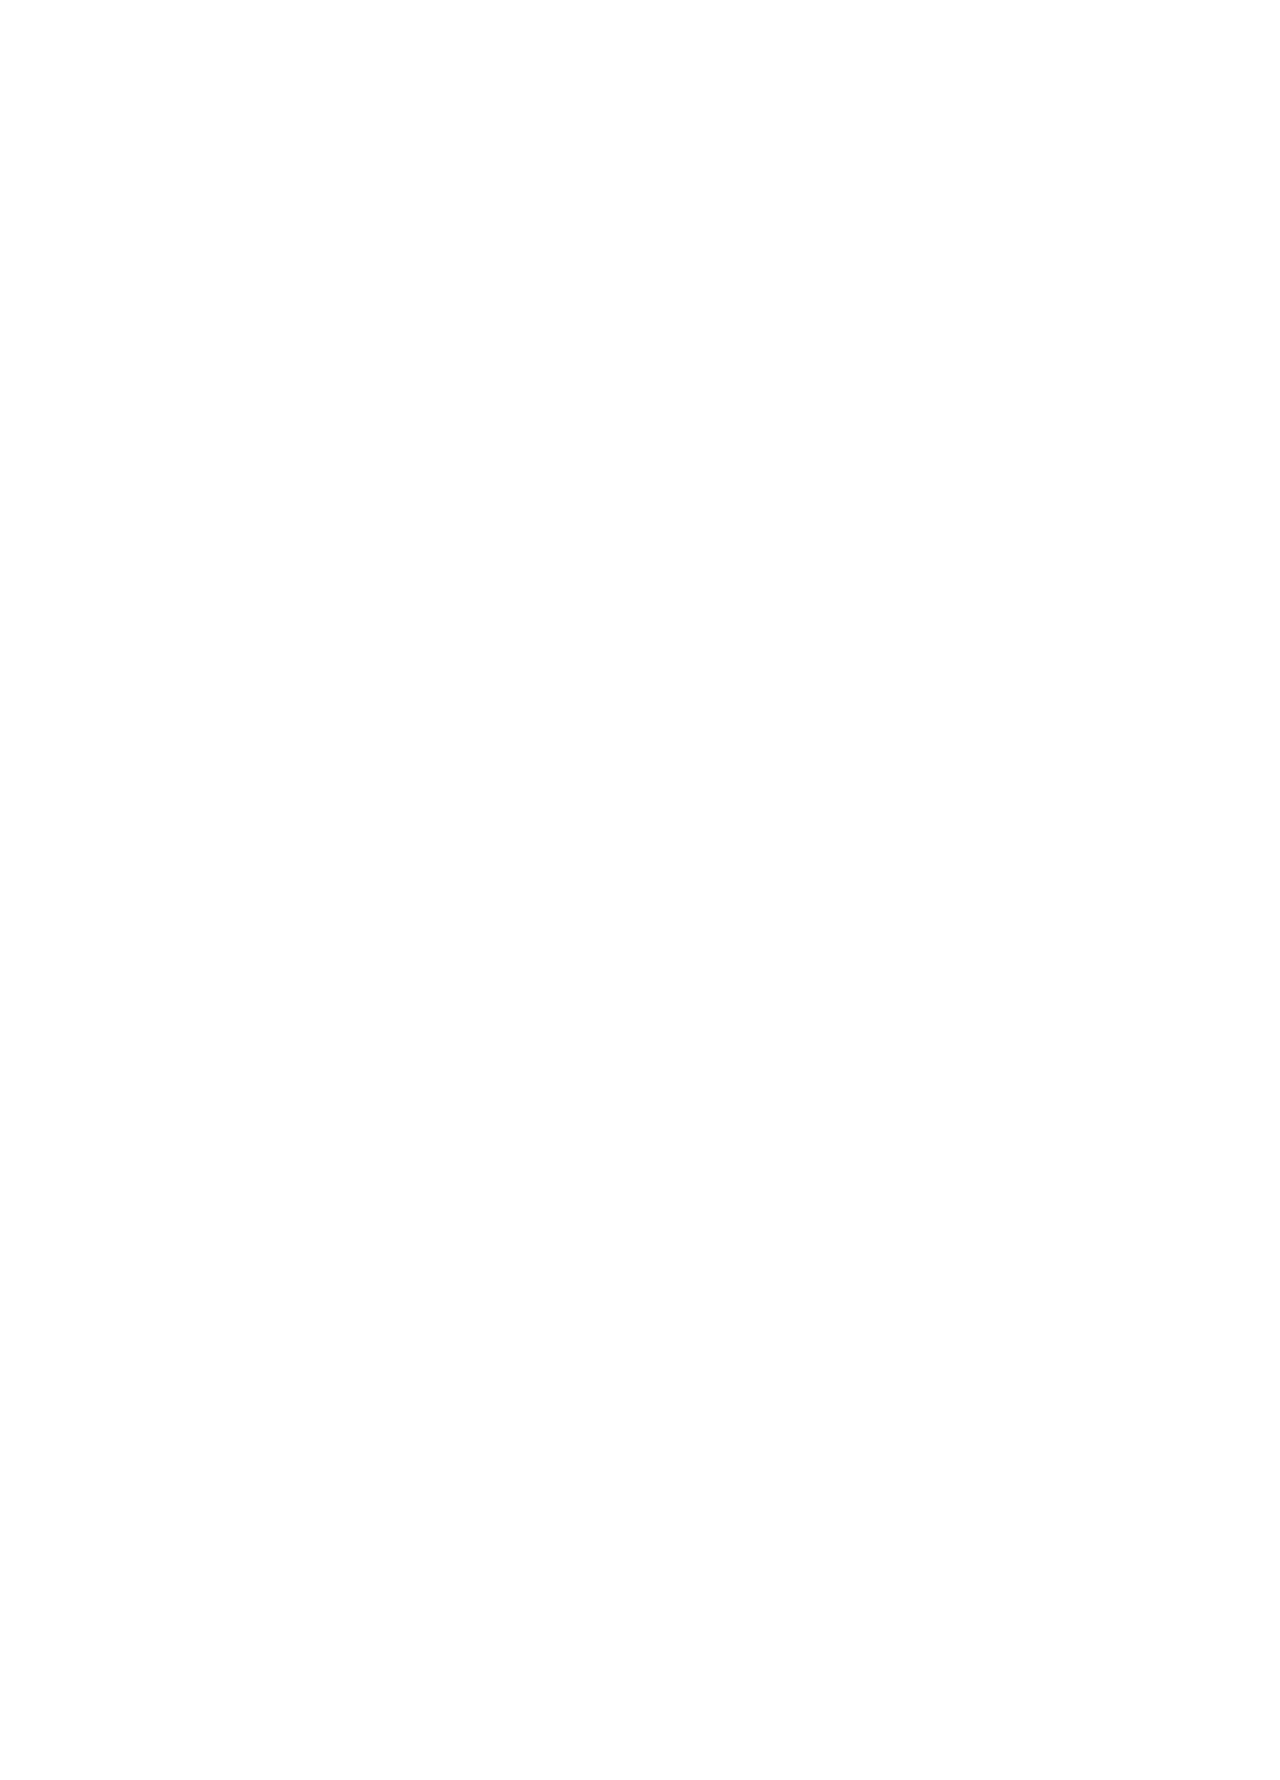 [Bronco Hitoritabi (Uchi-Uchi Keyaki)] Diver-nin Ayame to Ecchi na Mokeiya no Onee-san (Gundam Build Divers) [Digital] 1